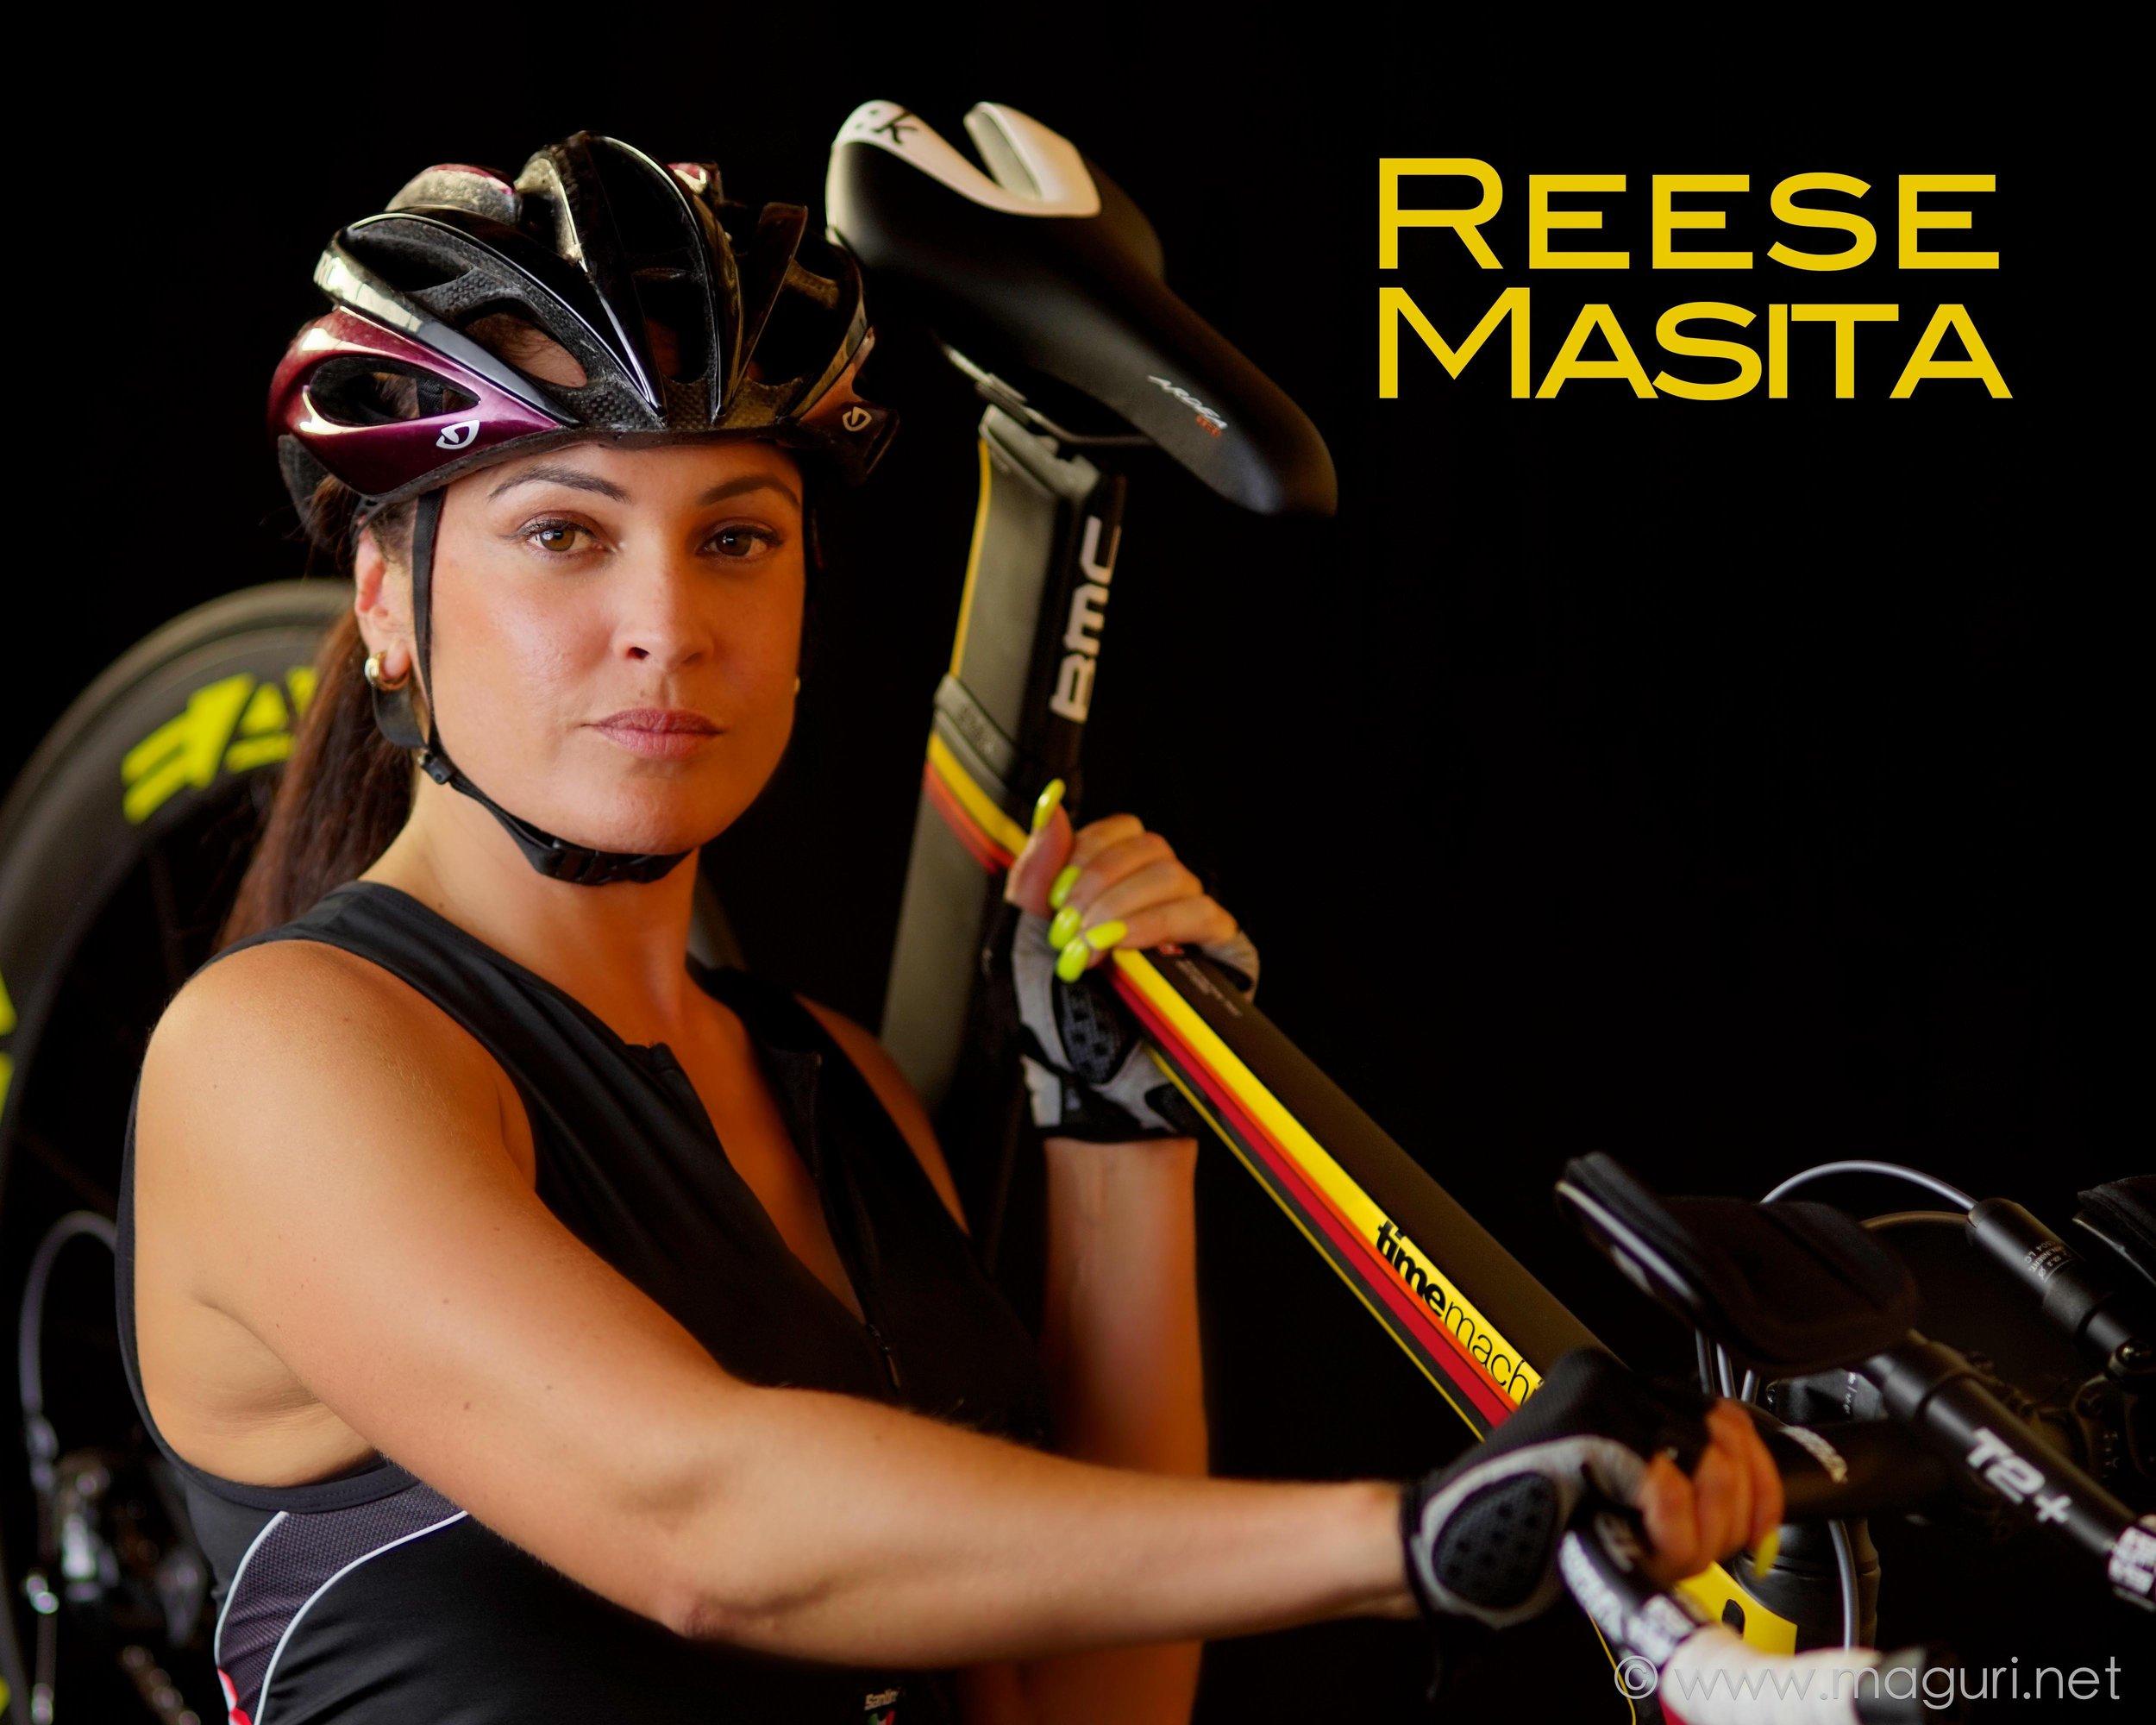 Reese Masita Titled.jpg